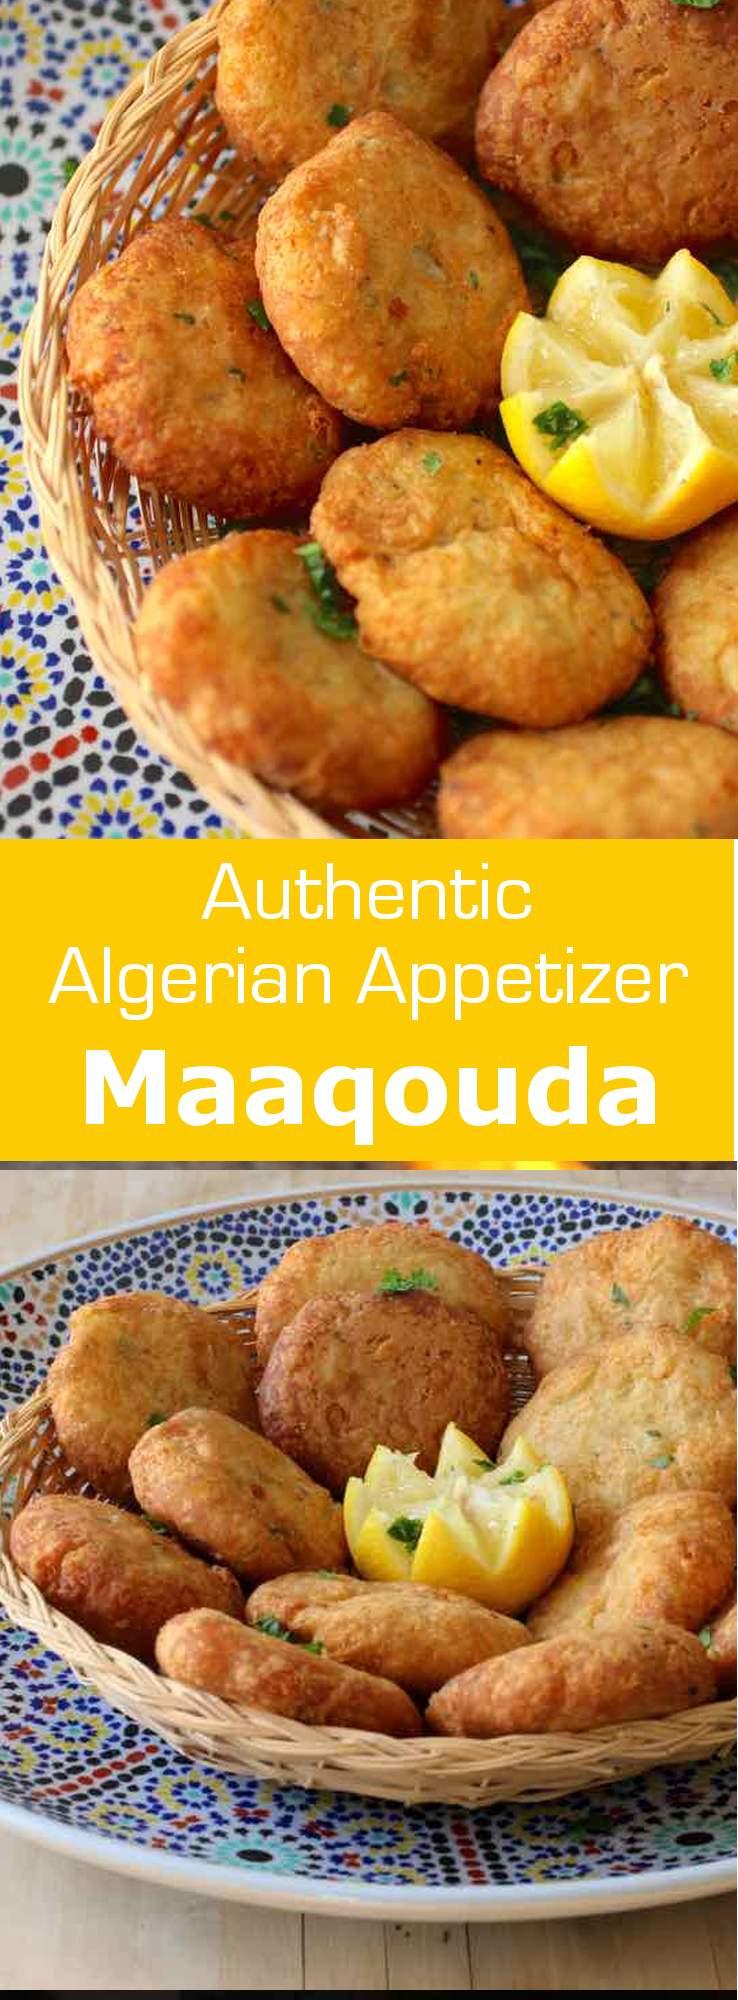 Maaqouda is a potato fritter recipe that is popular throughout North Africa. It is especially prepared during the Ramadan period. #algeria #tunisia #algeria #maghreb #ramadan #196flavors